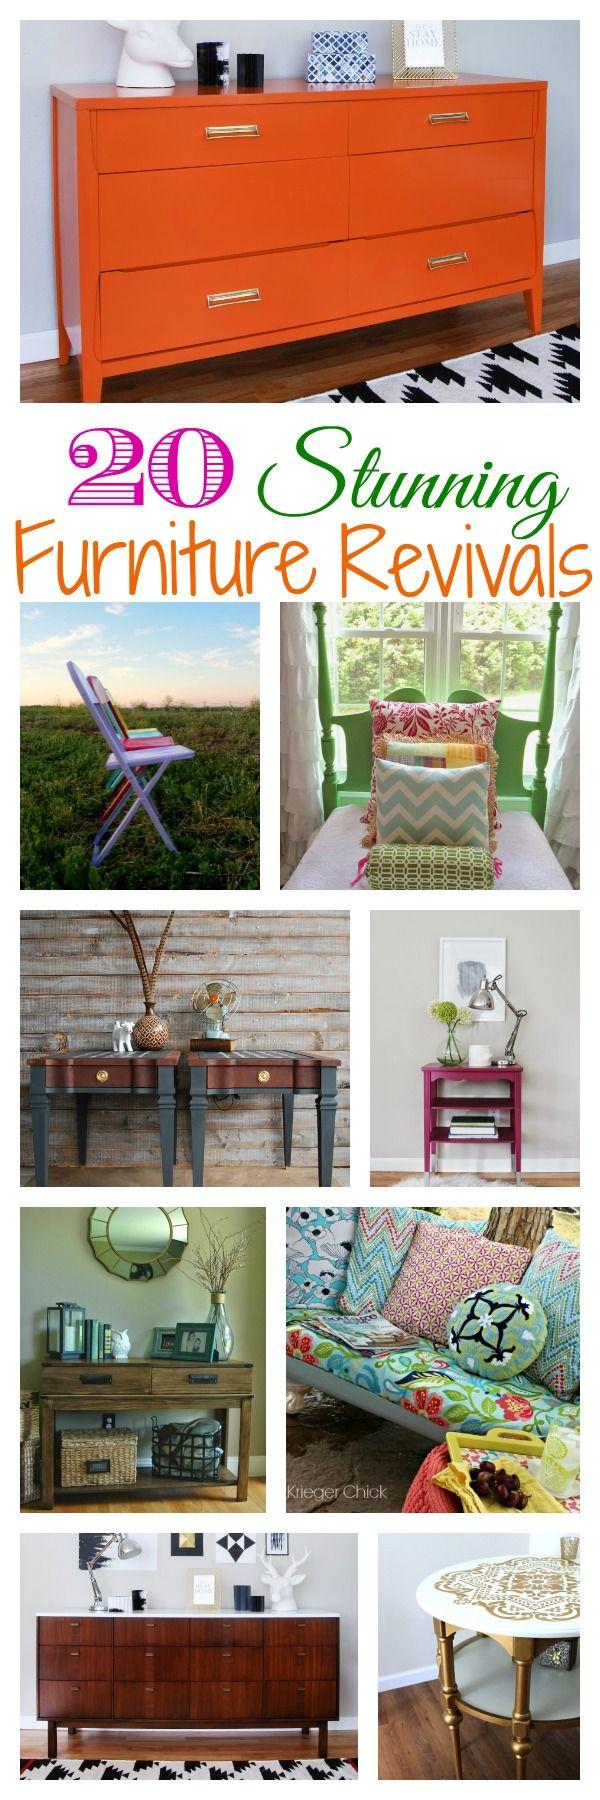 20 Stunning Furniture Revivals {DIY Challenge Features} - The Happy Housie